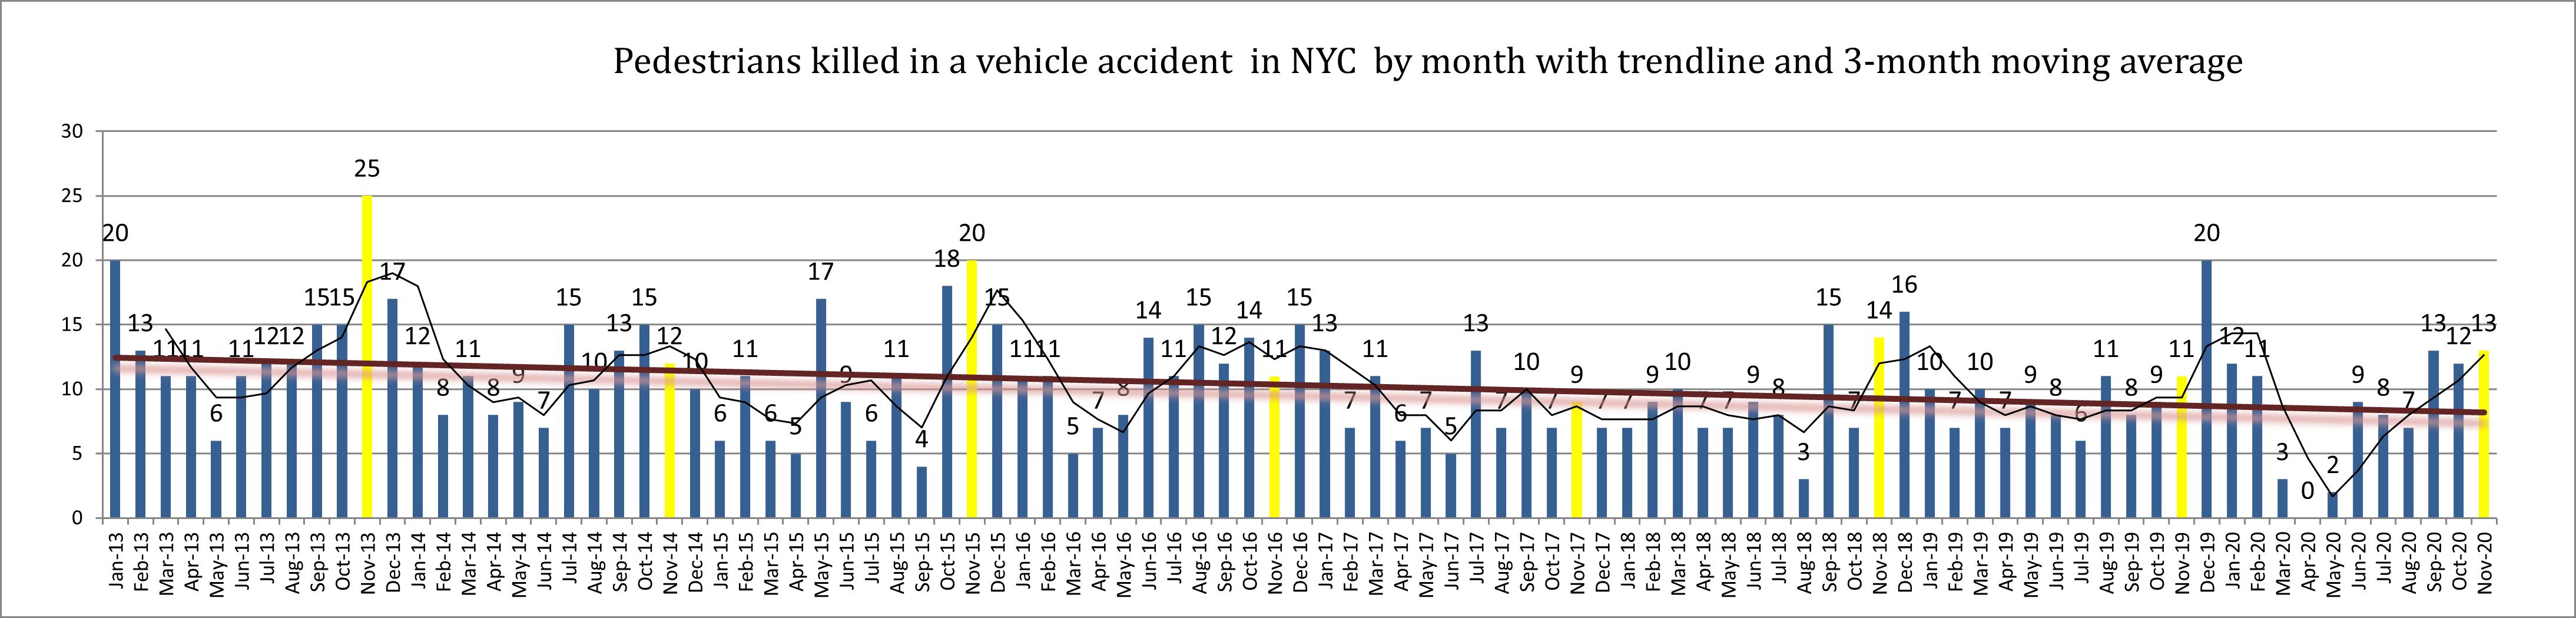 Pedestrian accident deaths November 20 NYC